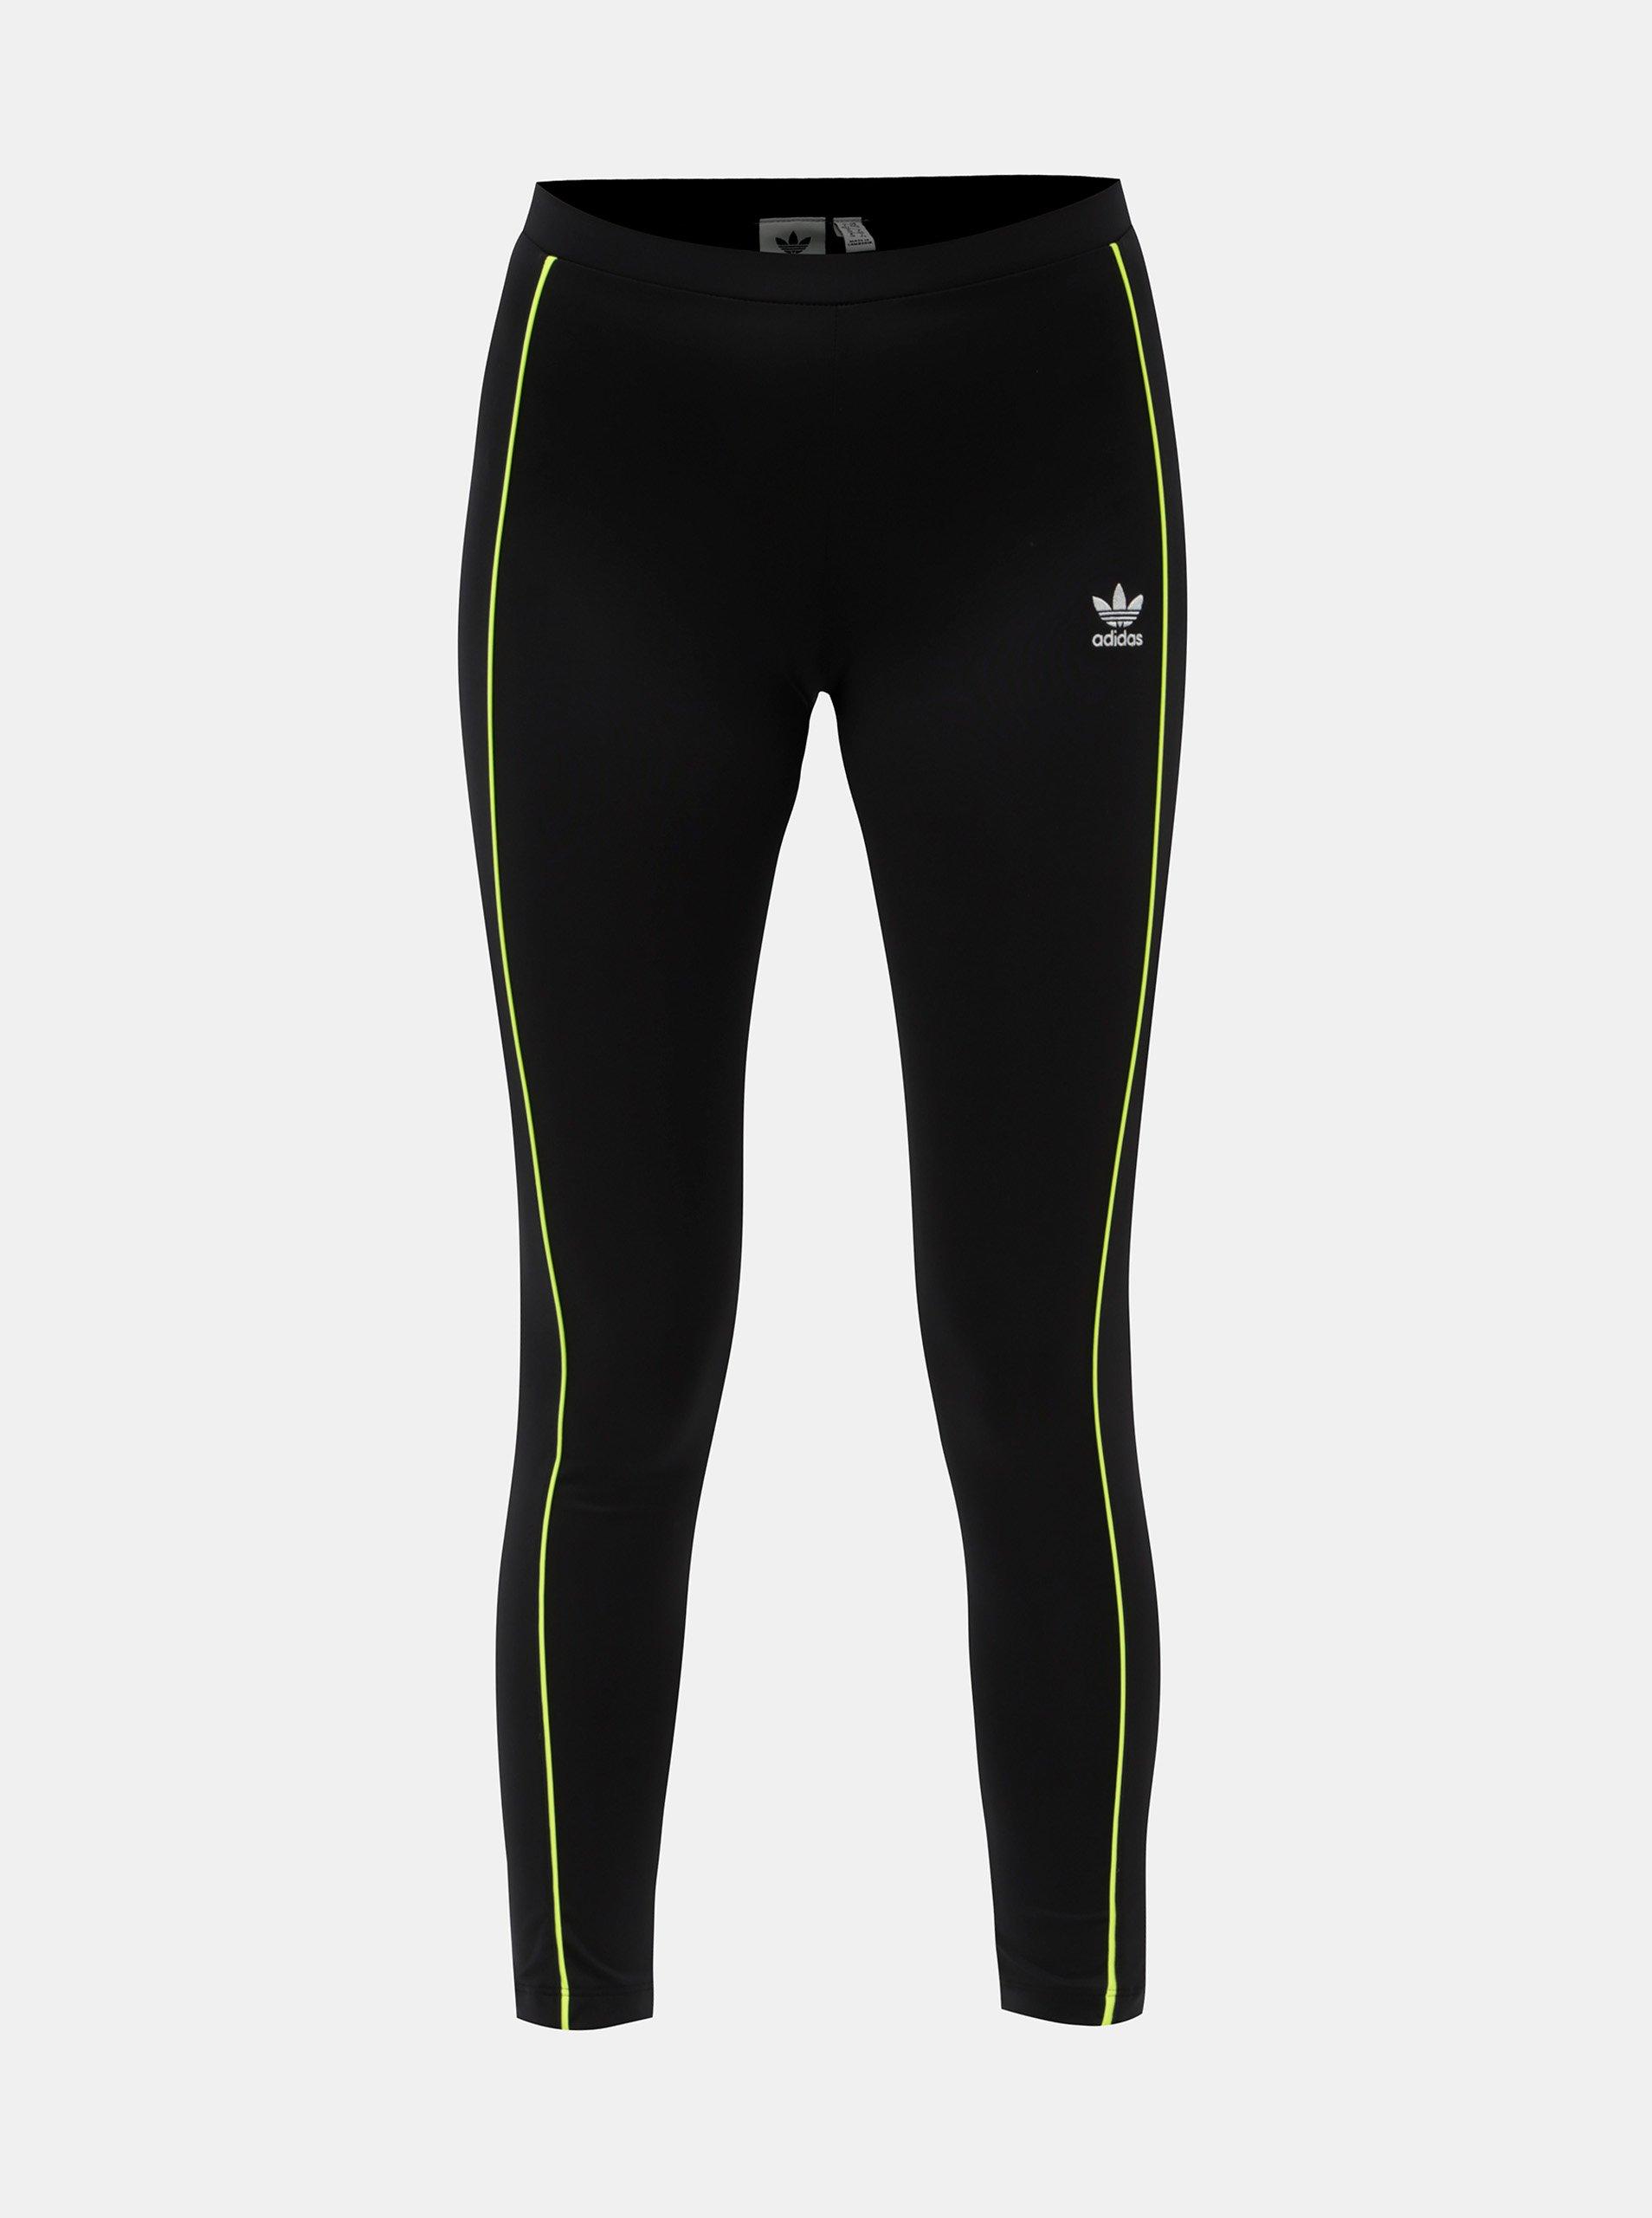 d81667acfc8c Čierne legíny s pruhmi adidas Originals